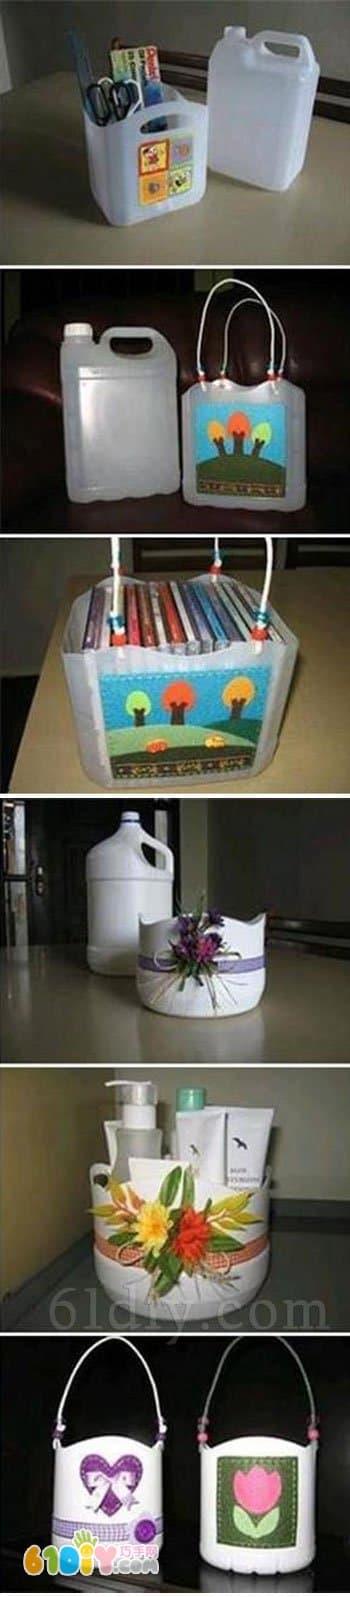 Plastic bucket handmade various storage baskets